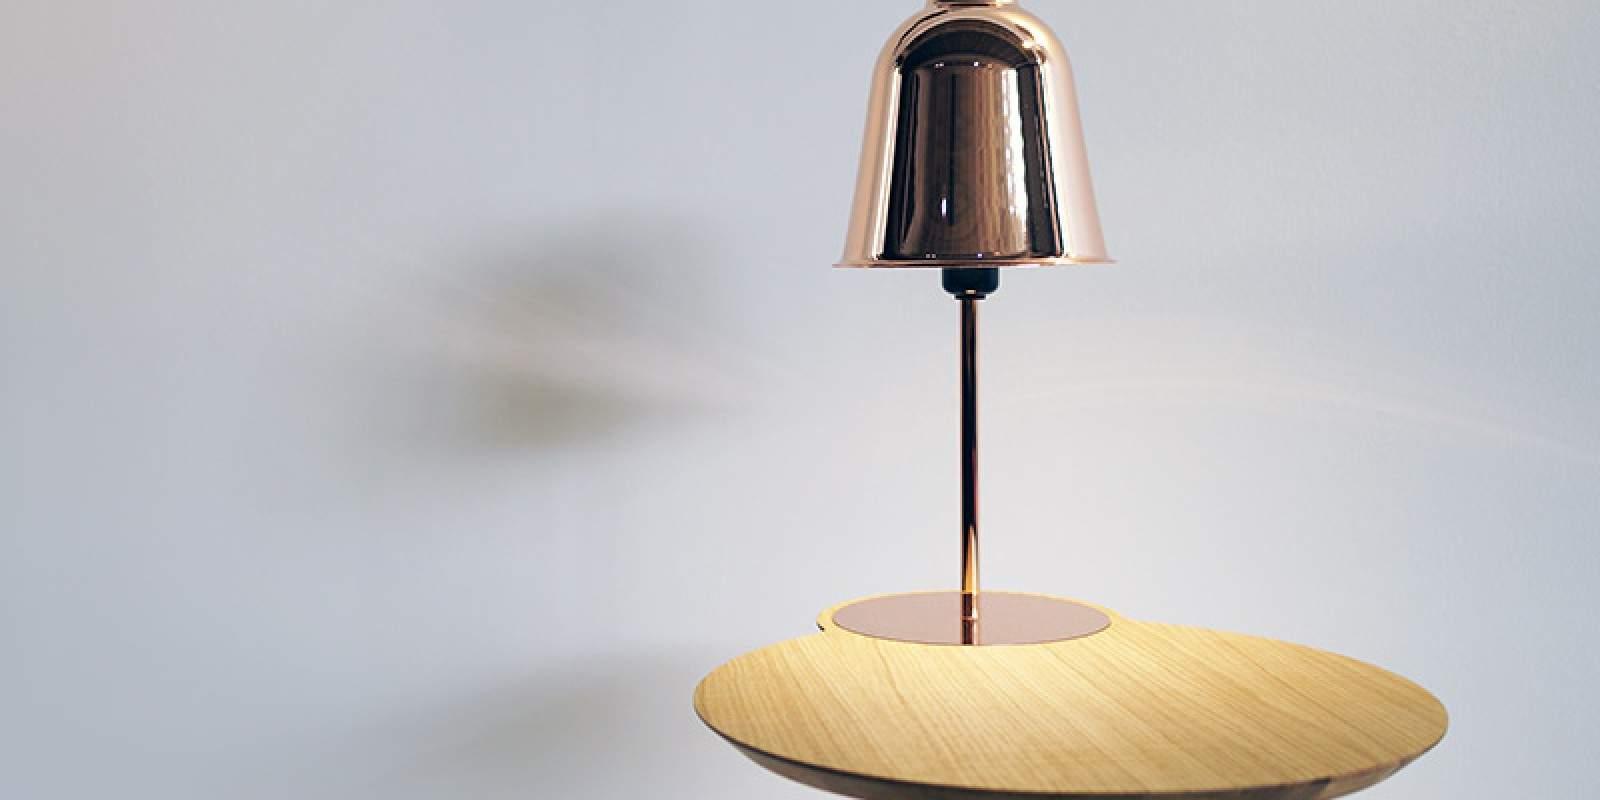 majordome chevet lampe concours cinna mo15 deco design. Black Bedroom Furniture Sets. Home Design Ideas